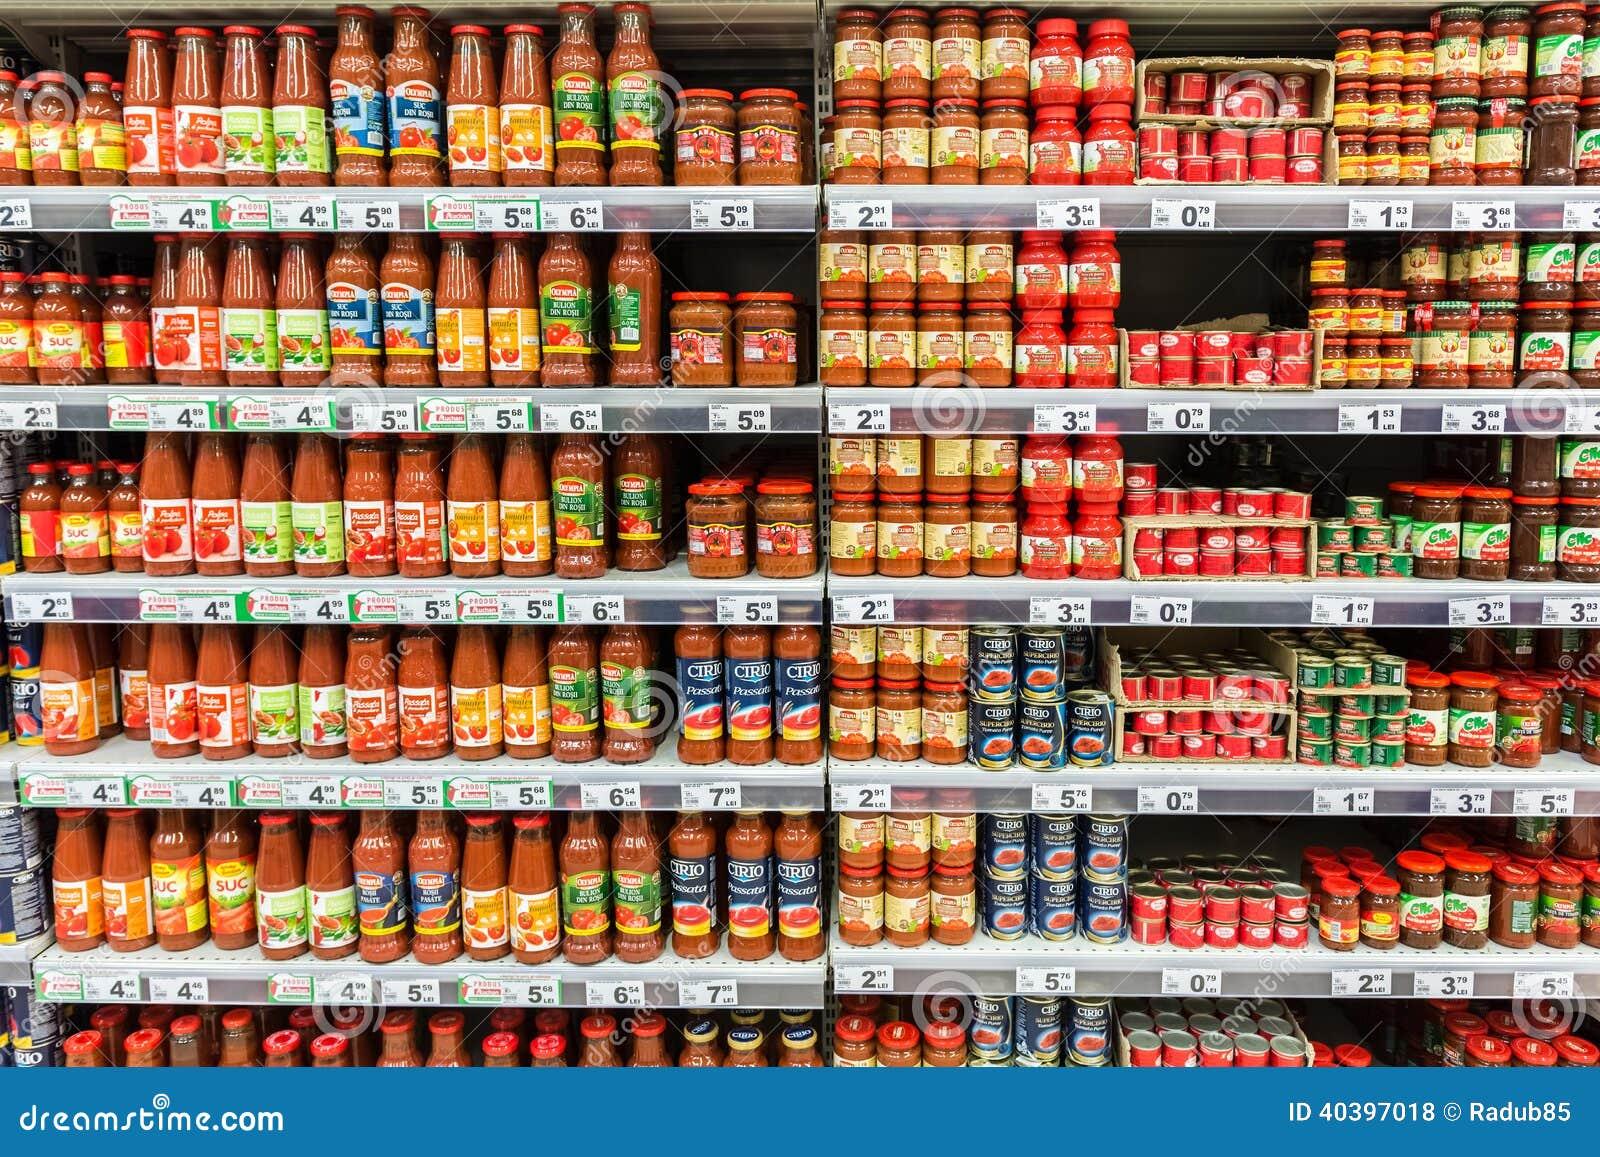 Ketchup Tomato Sauce Bottles